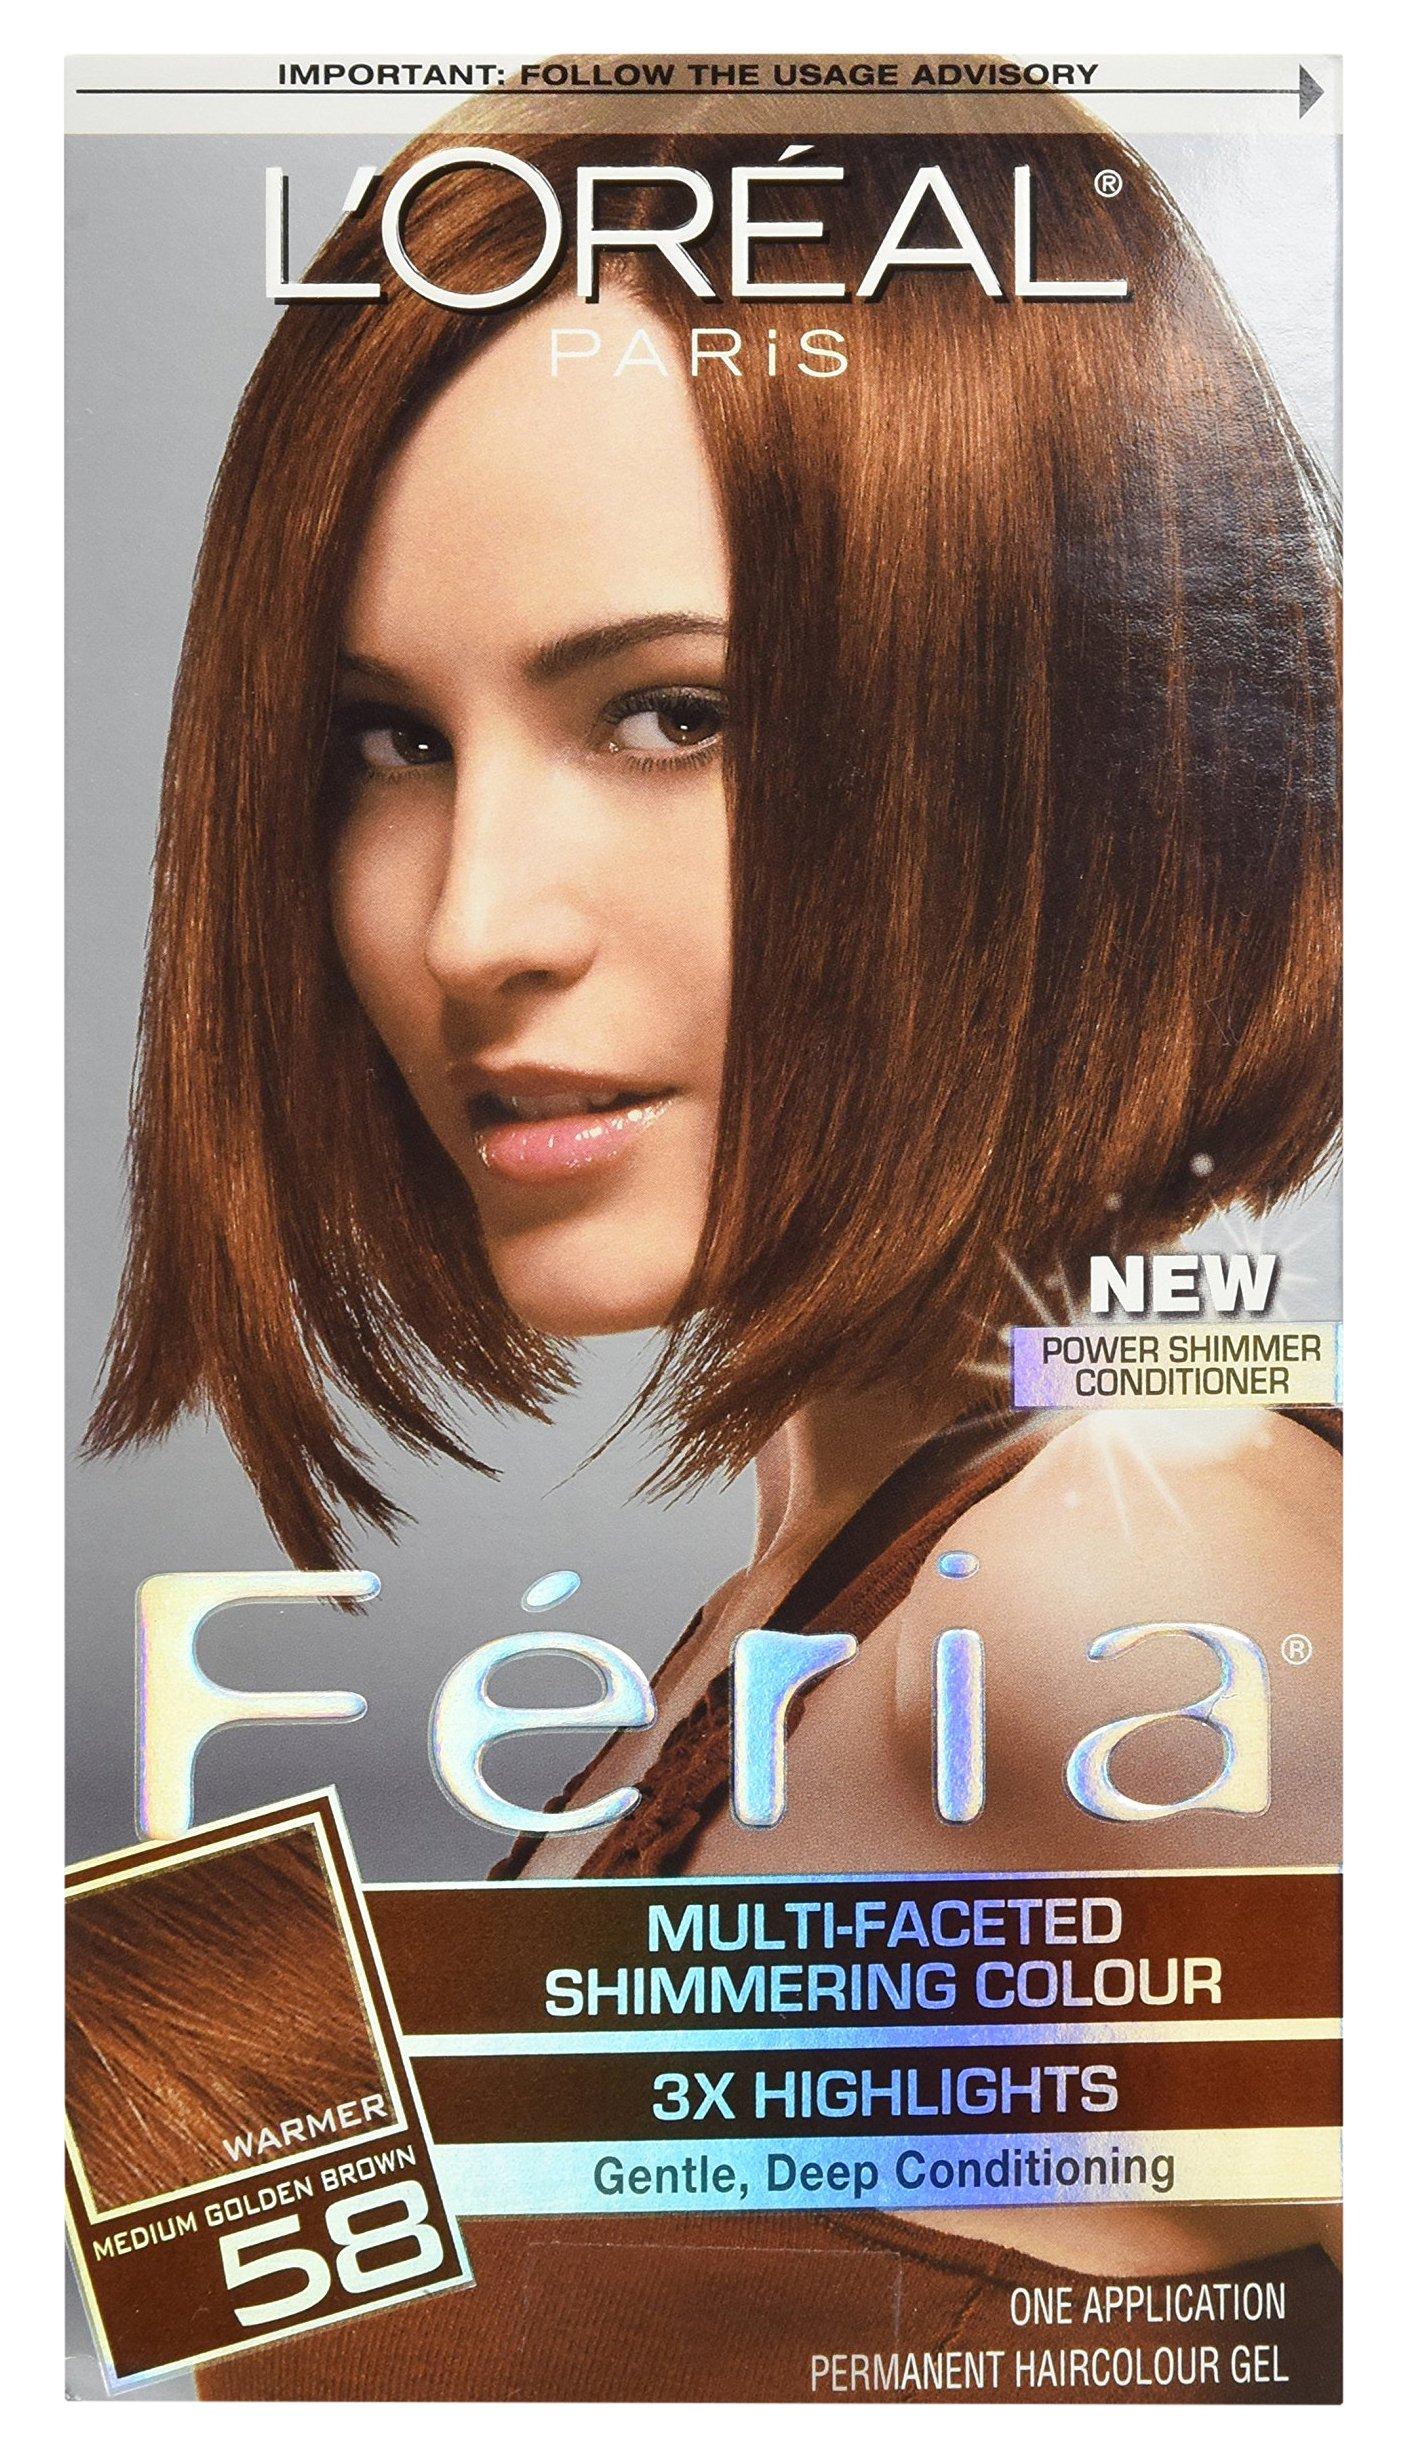 L'Oreal Feria Haircolor, Bronze Shimmer 58 1 ea by L'Oreal Paris